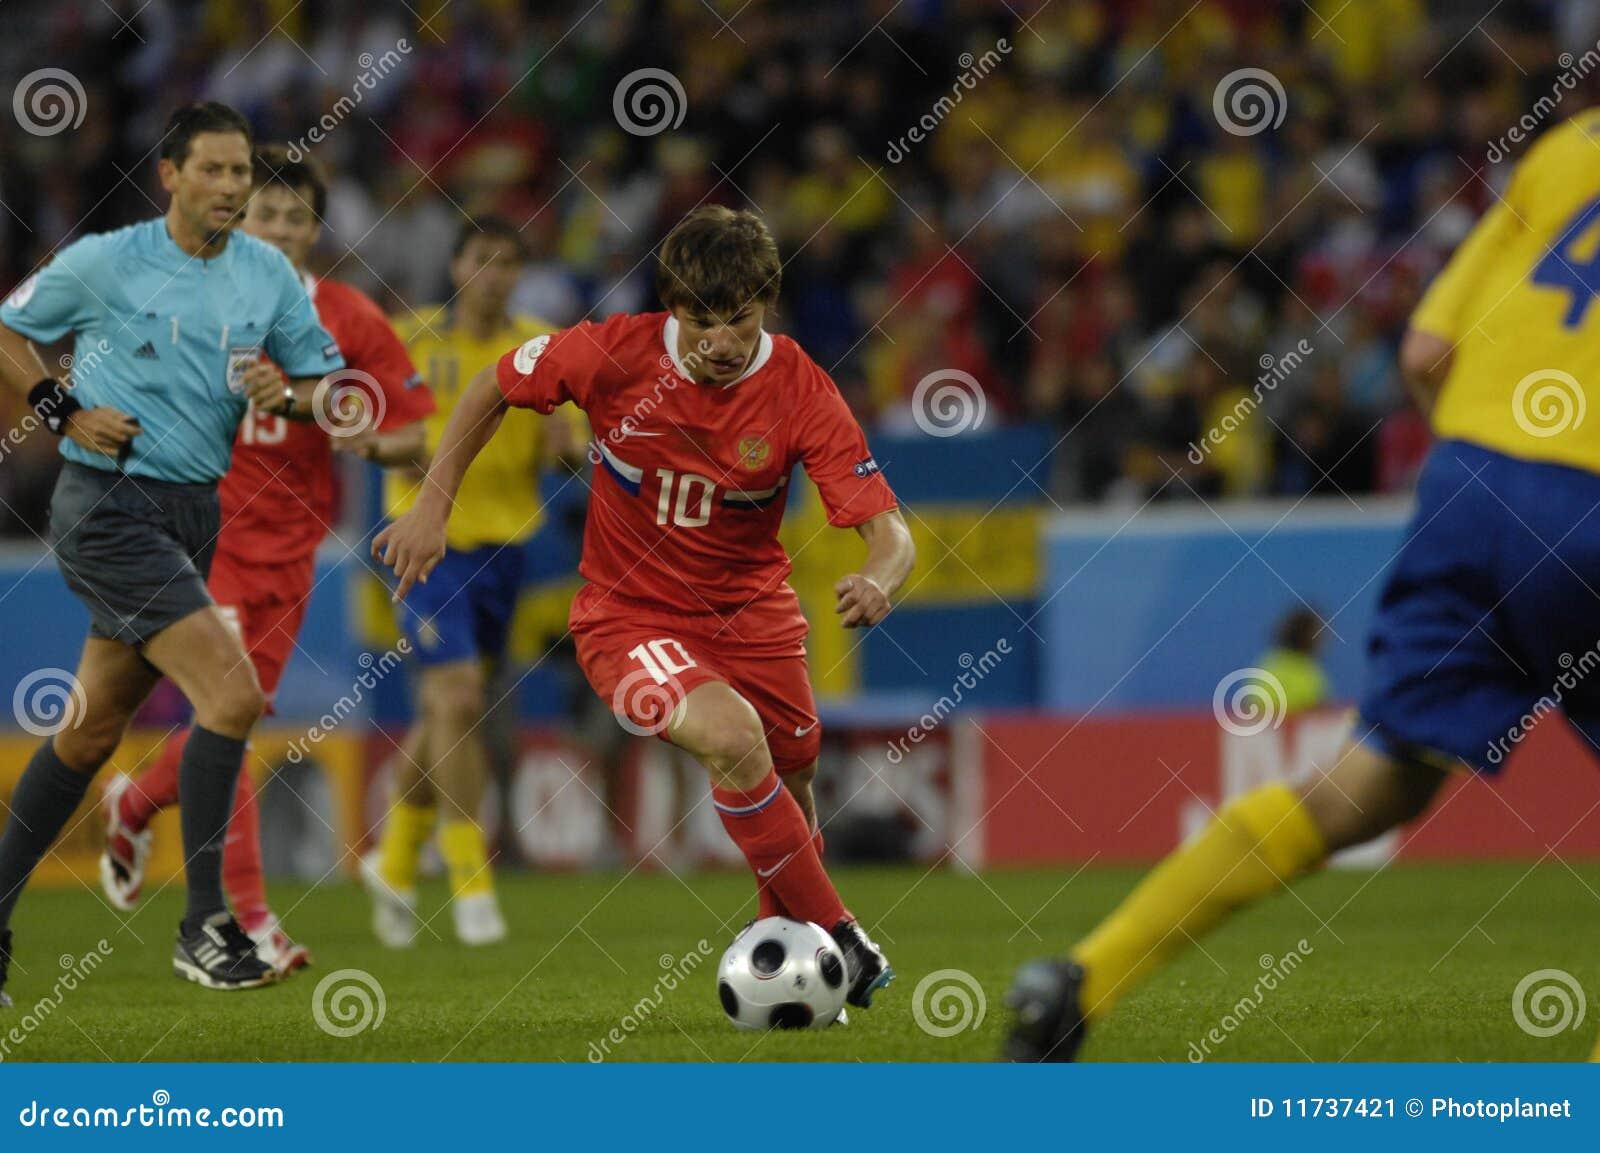 FranceFootball 2009 melhores 30Players Andrei Arshavin